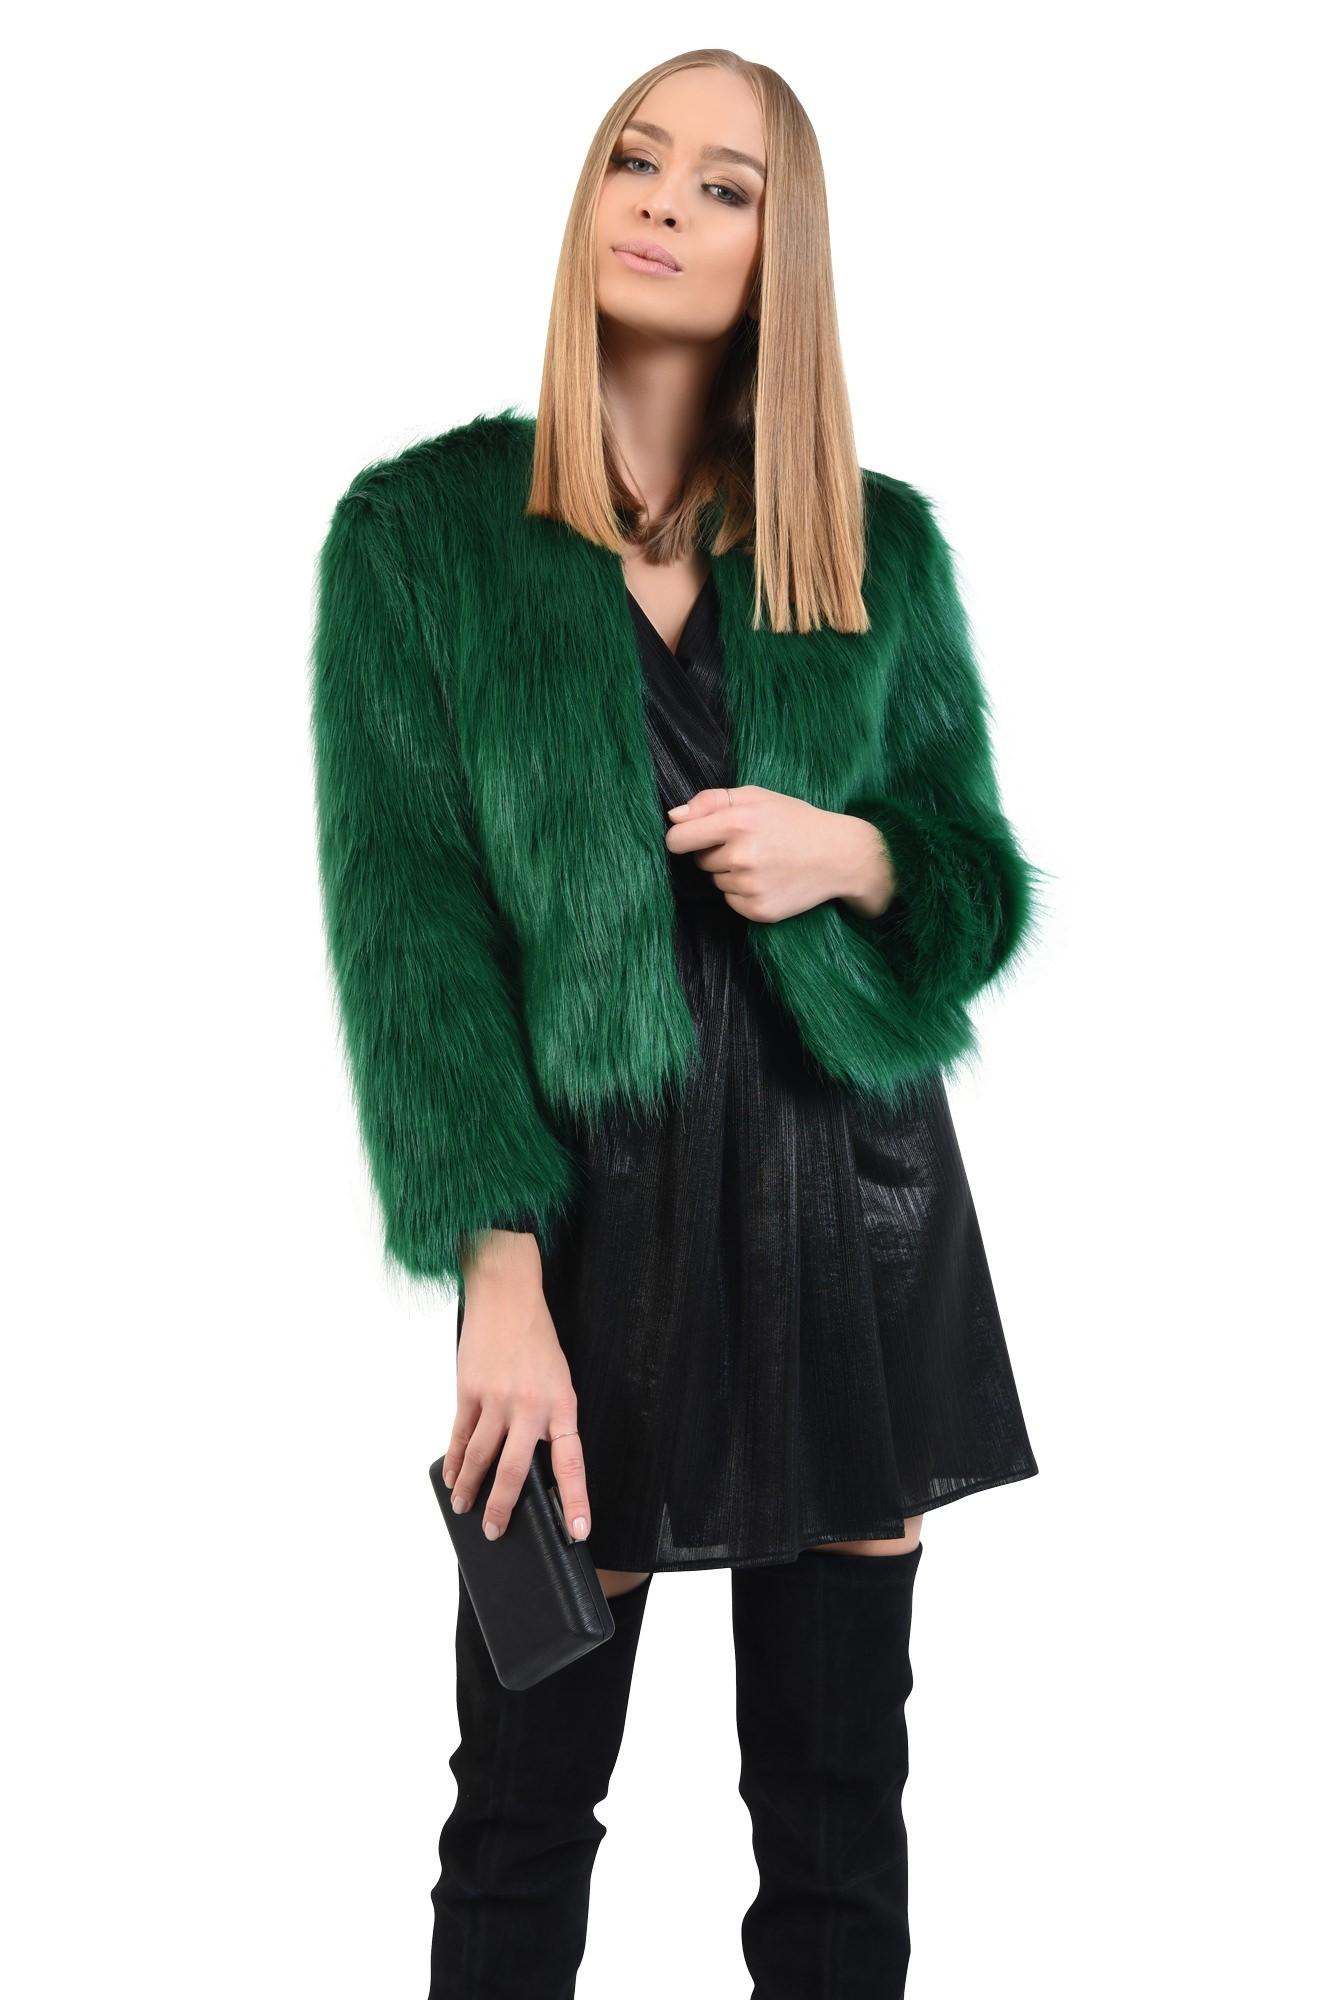 2 - jacheta verde, blana artificiala, maneci lungi